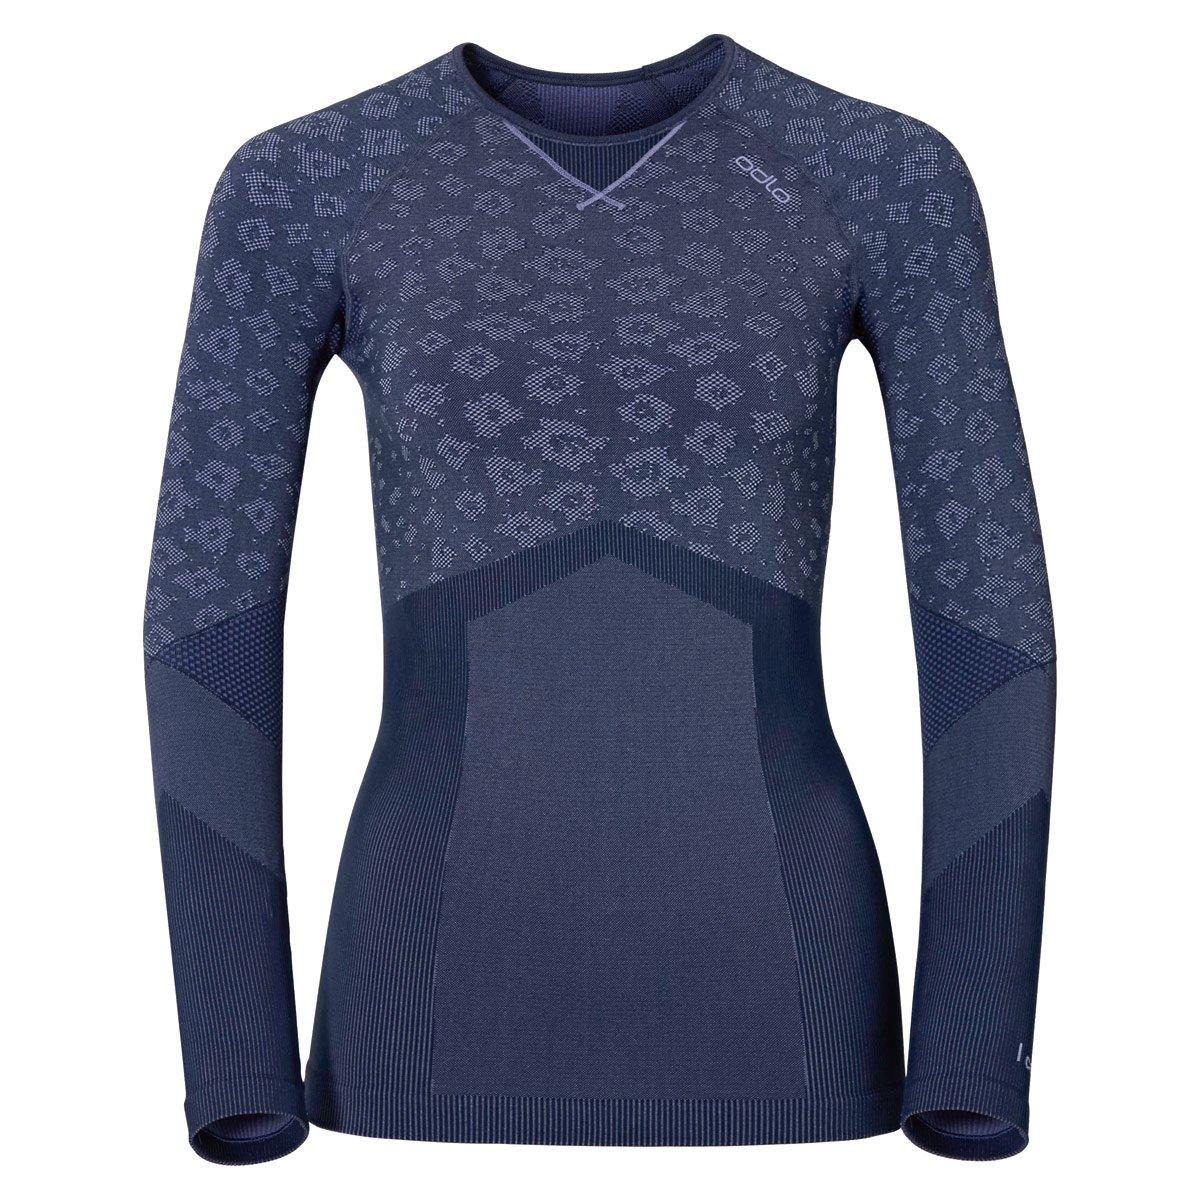 Odlo Damen Long Sleeve Shirt Crew Neck Blackcomb Evolution Dusted Peri Melange-Navy New XS 170951